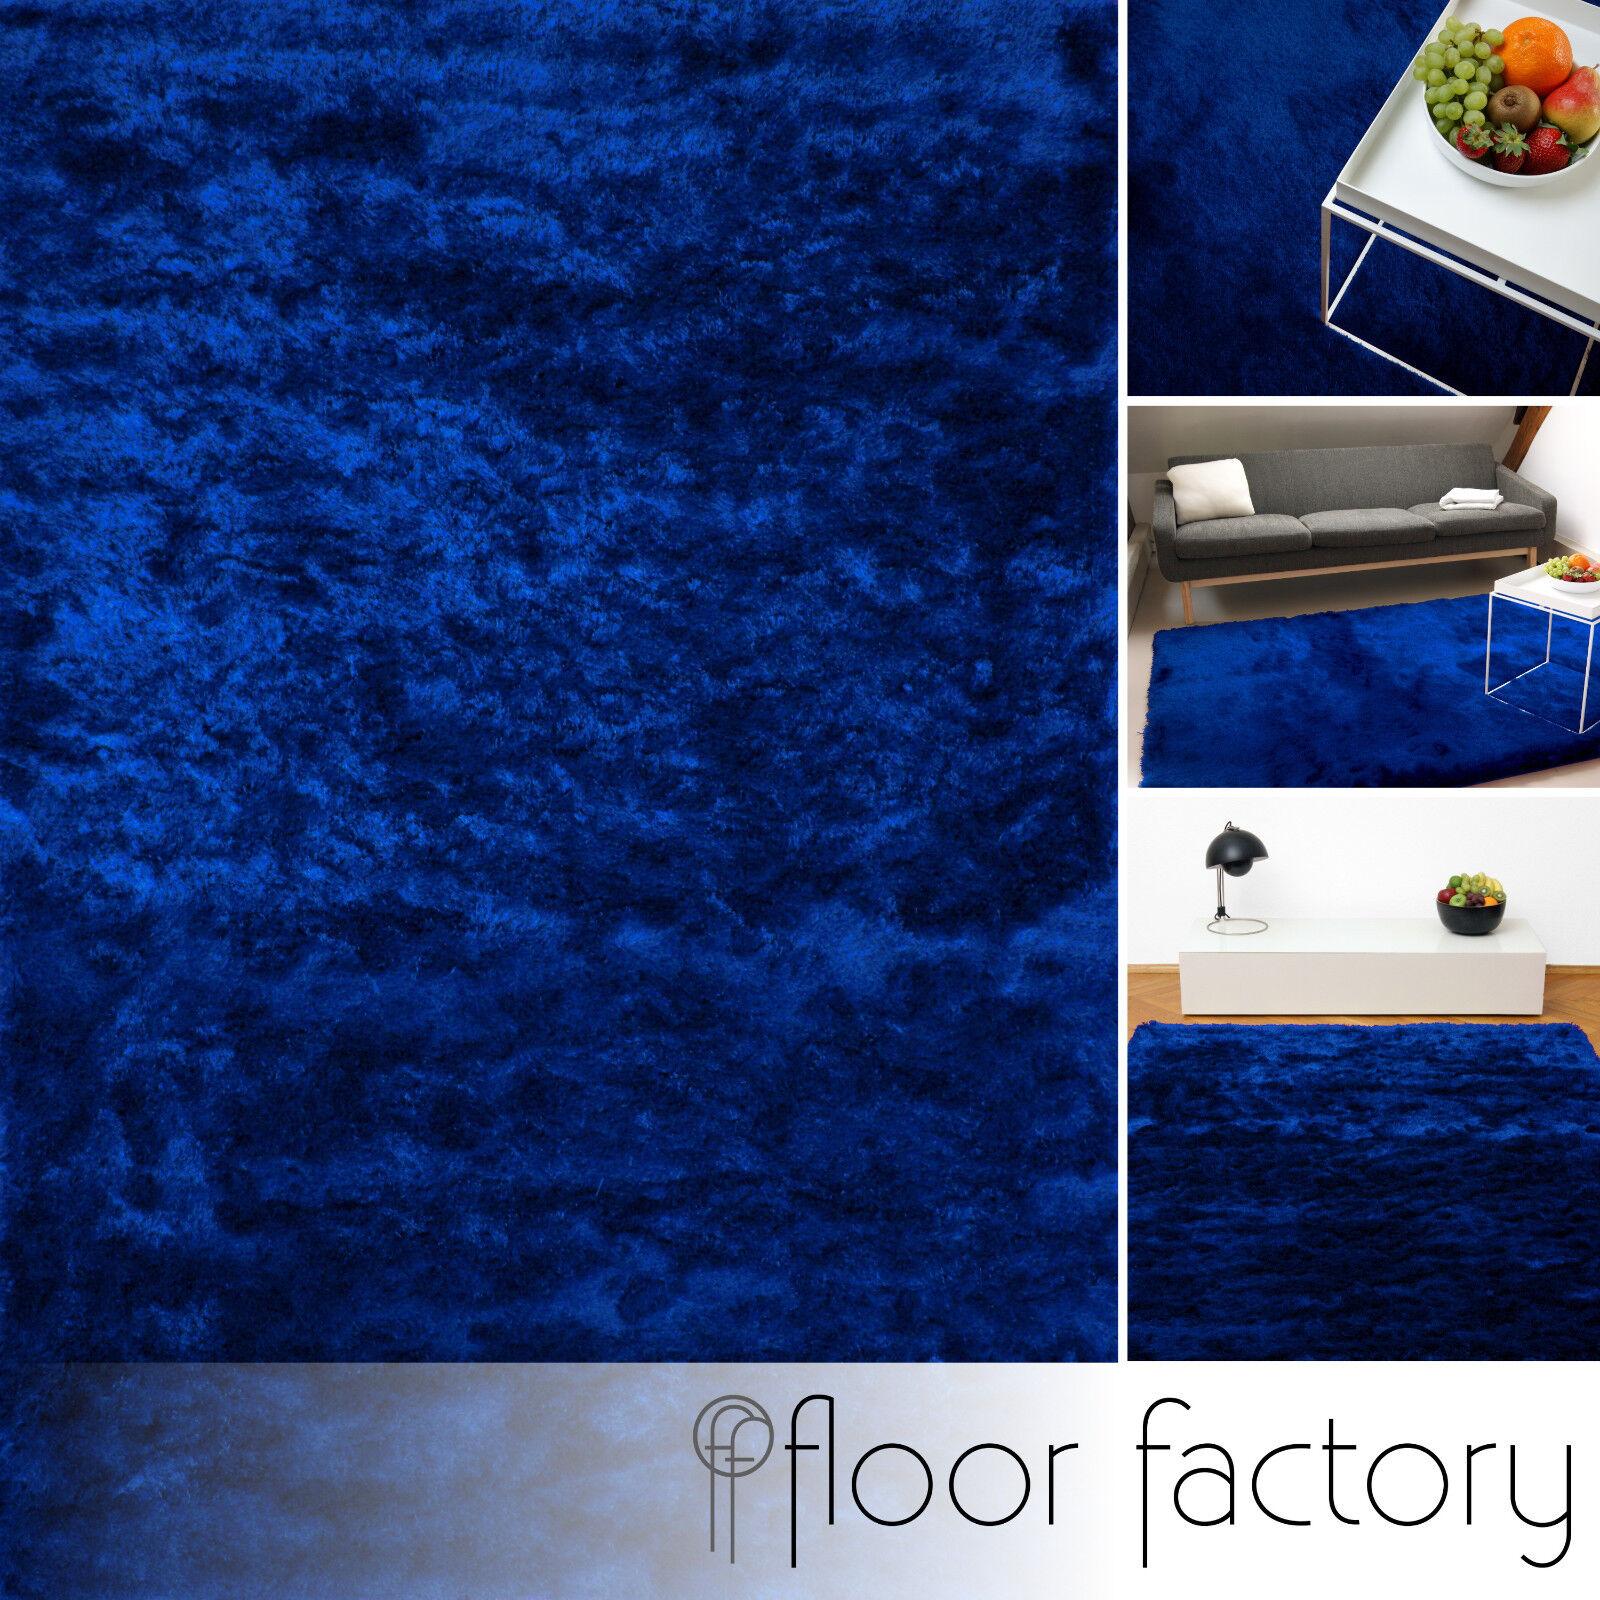 Exklusiver Hochflor Shaggy Teppich Satin Luxus Edition Edition Edition bf8011